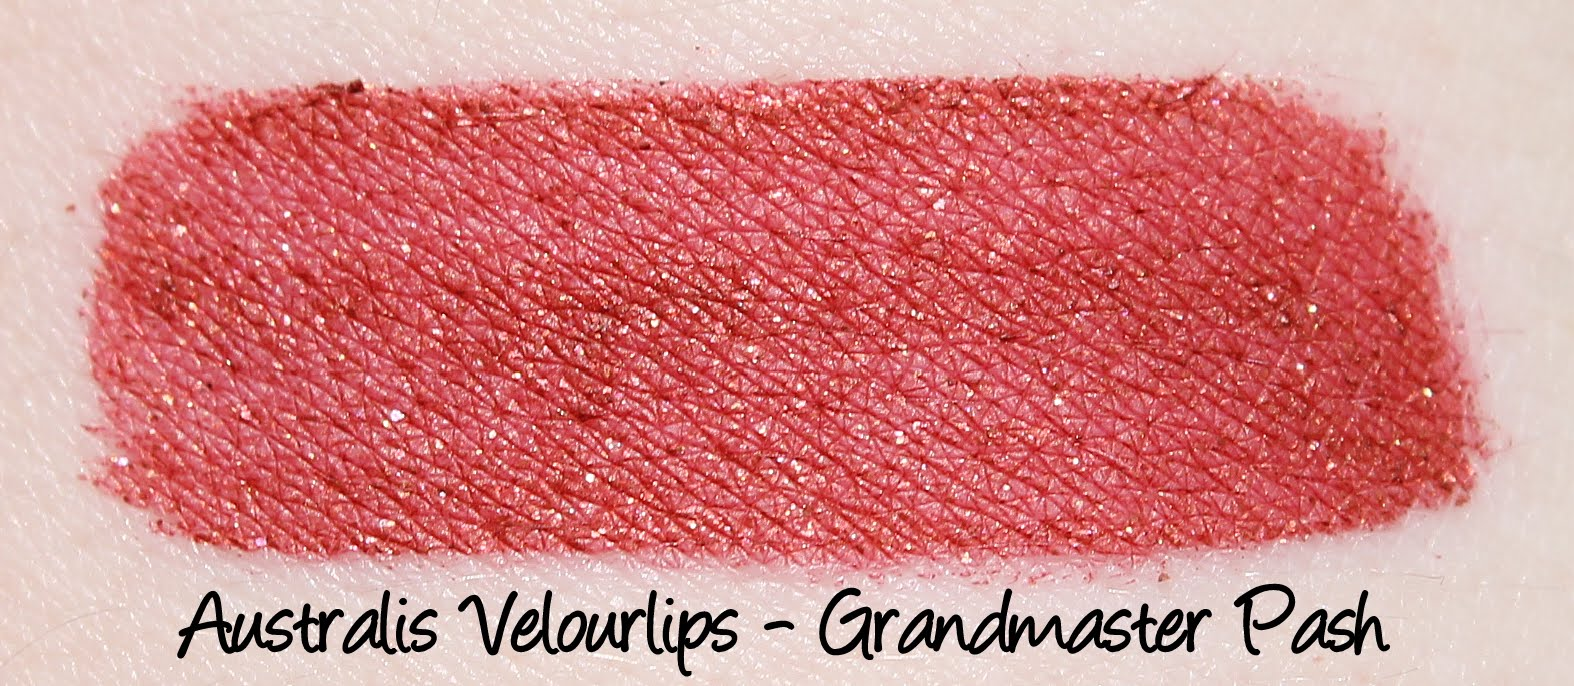 Australis Velourlips - Grandmaster Pash Swatches & Review